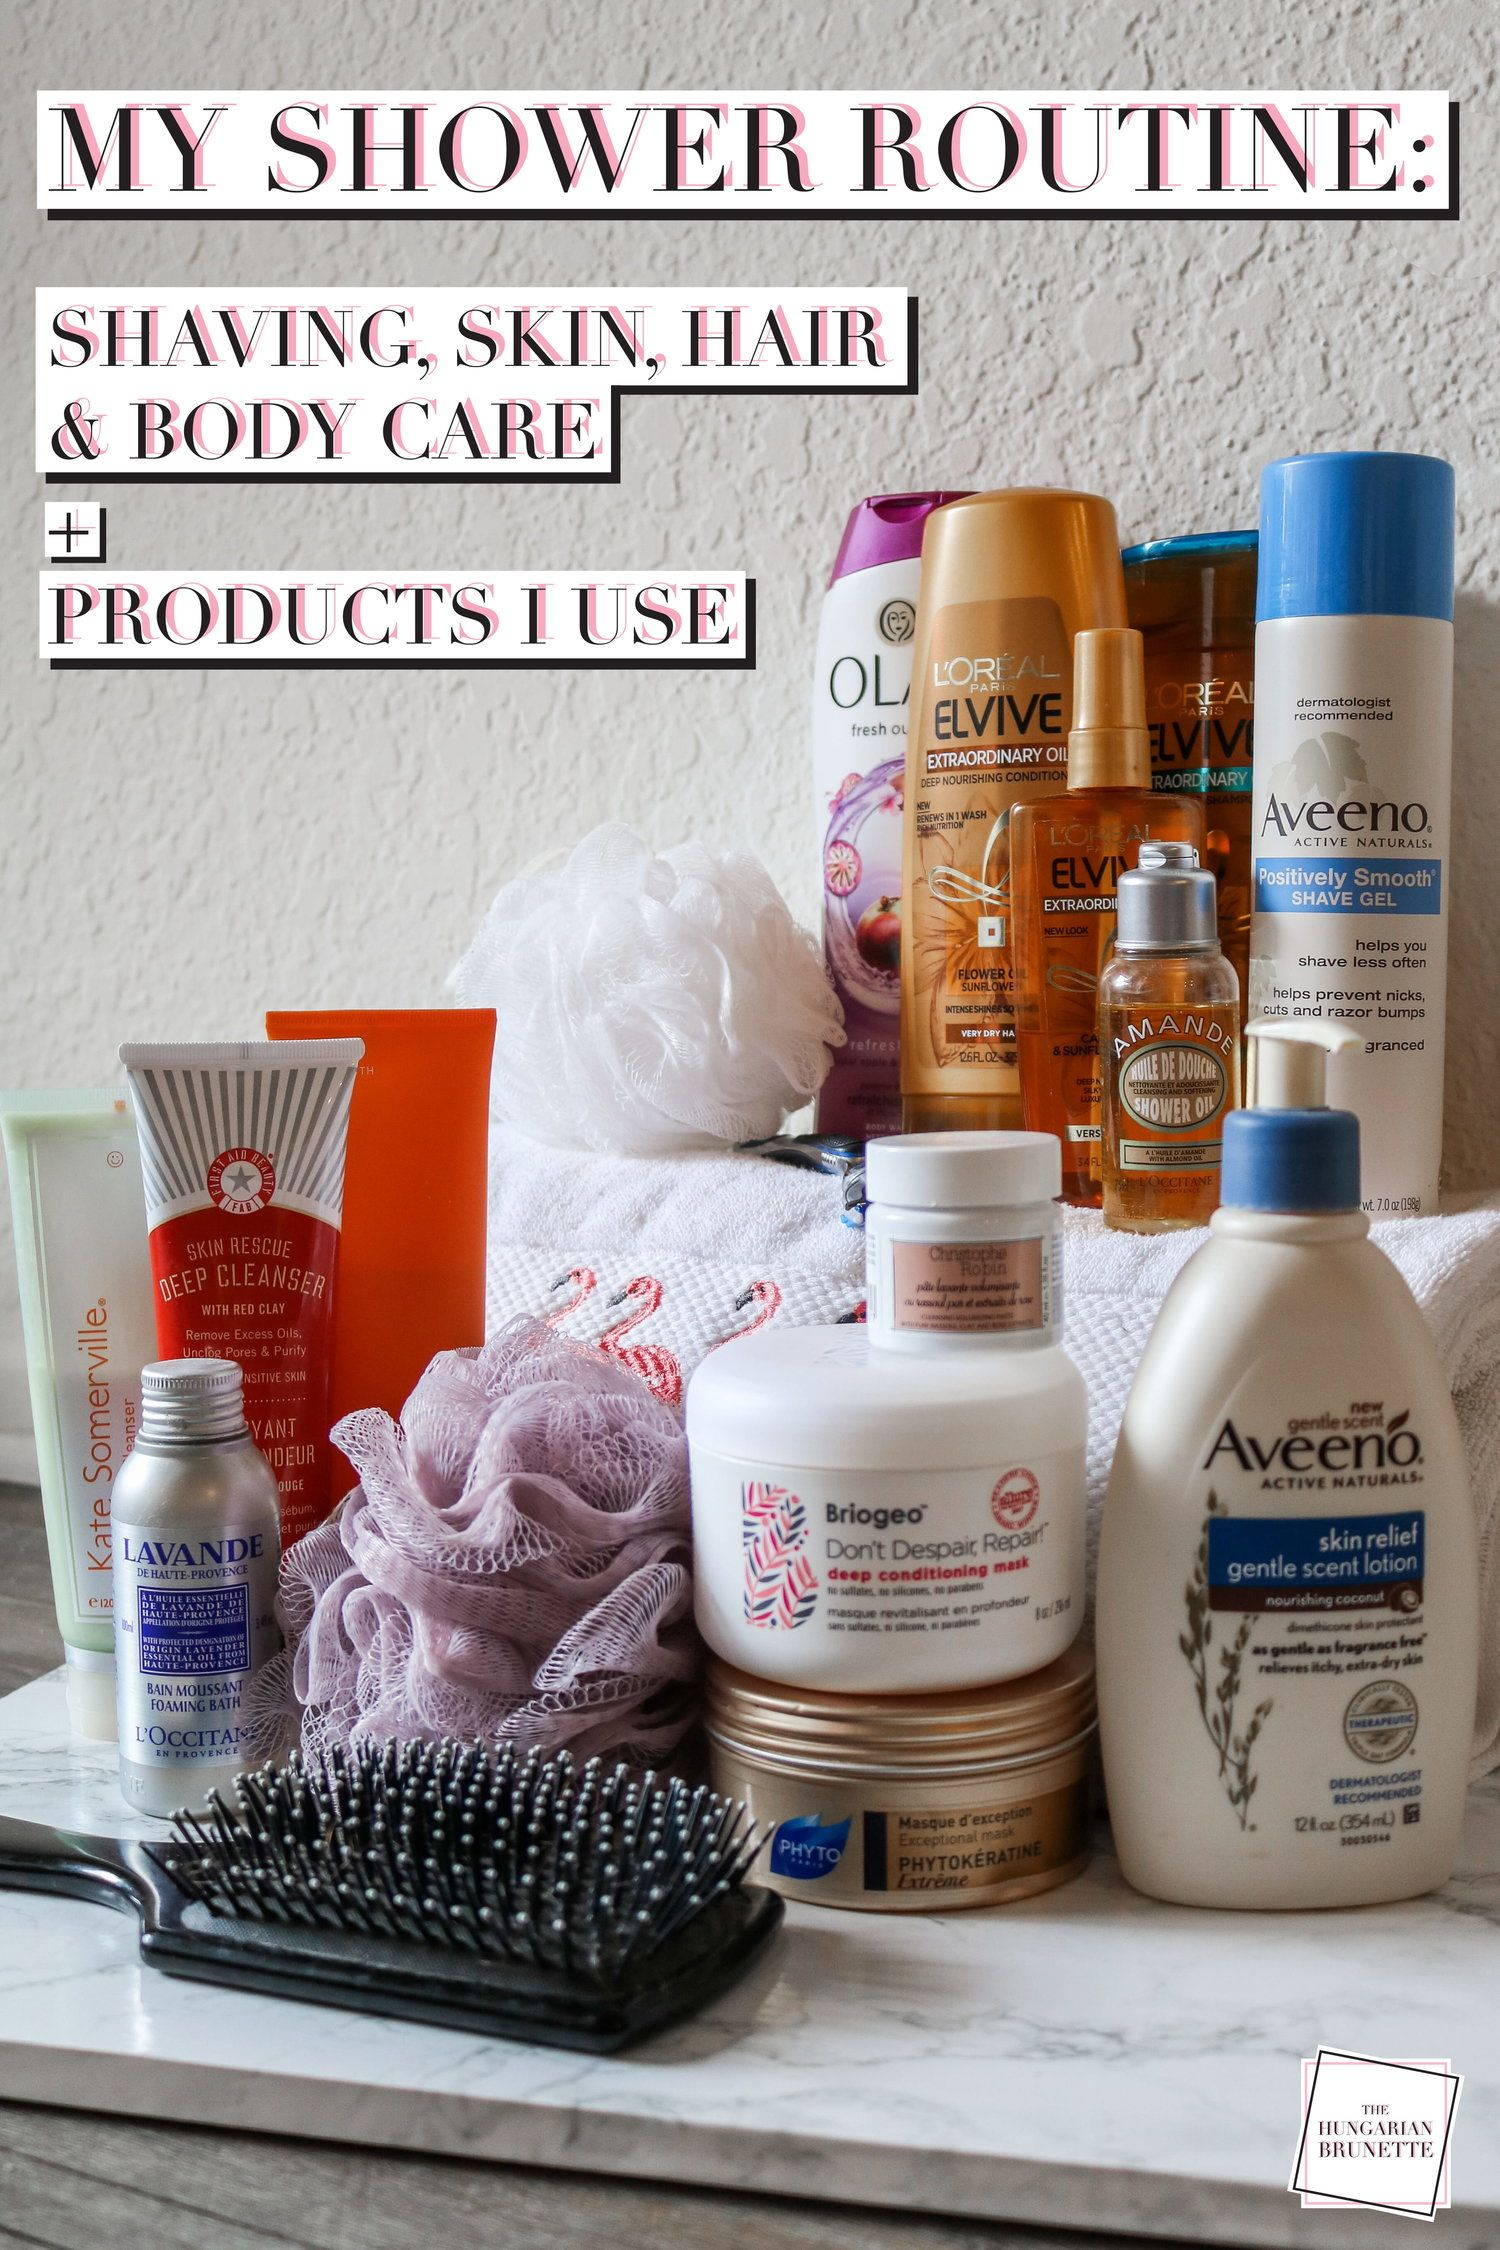 My shower routine shaving skin hair body care